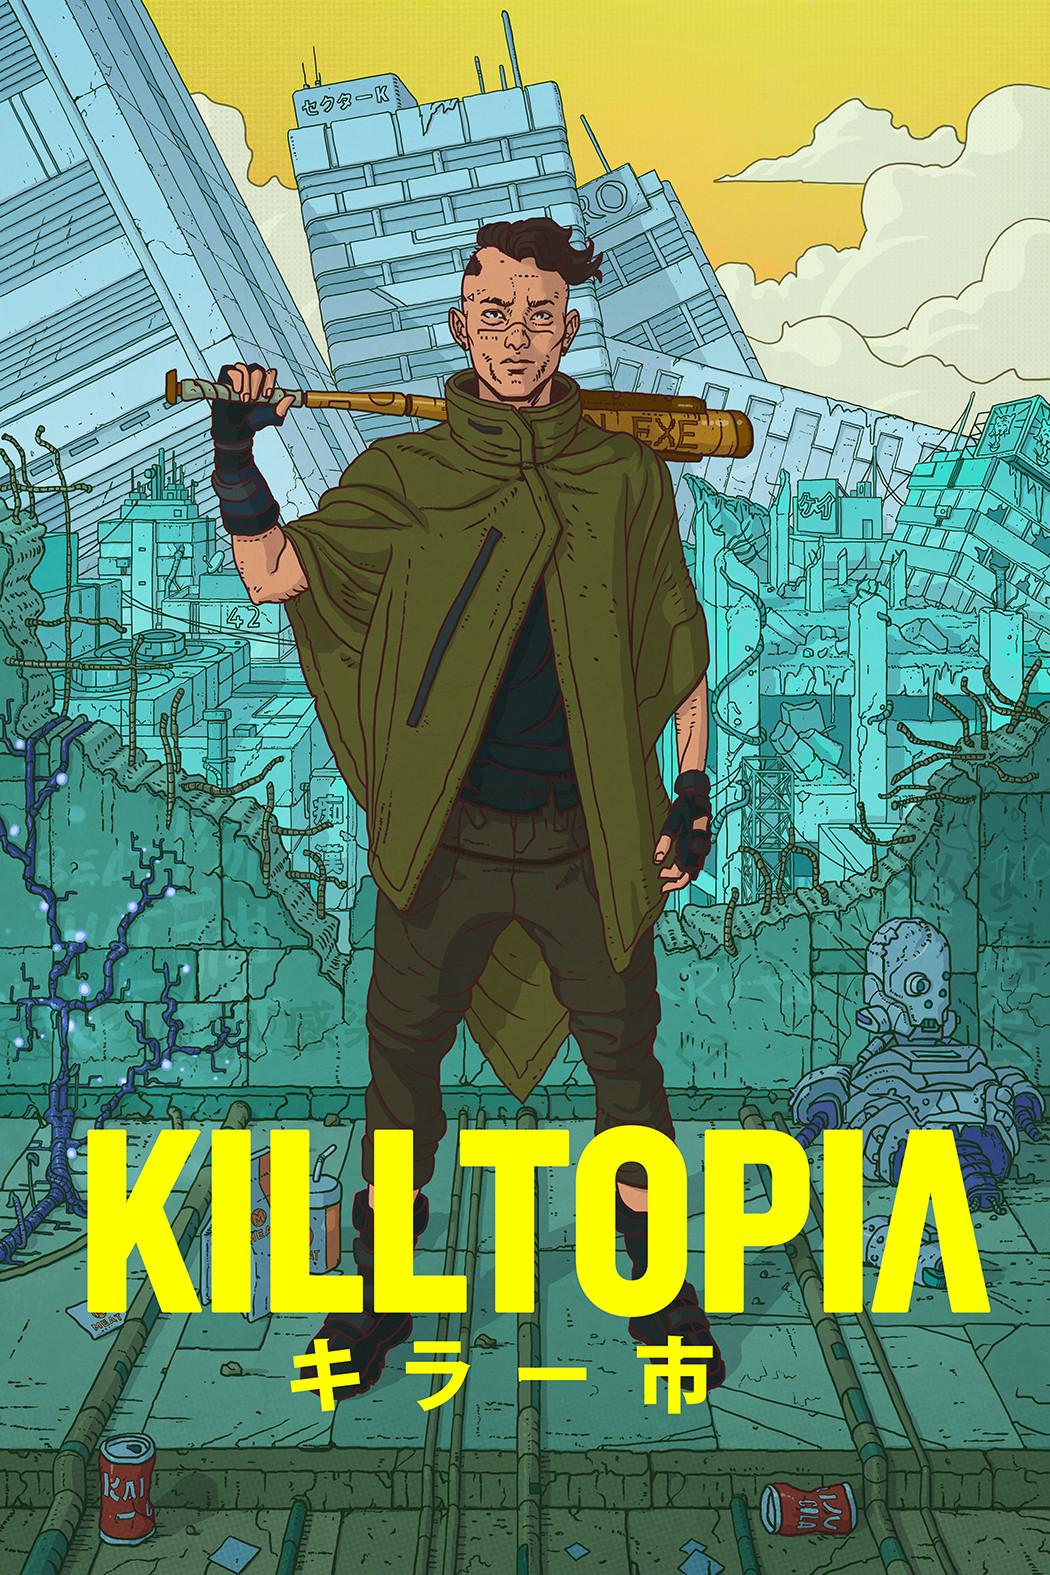 Killtopia: Shinji